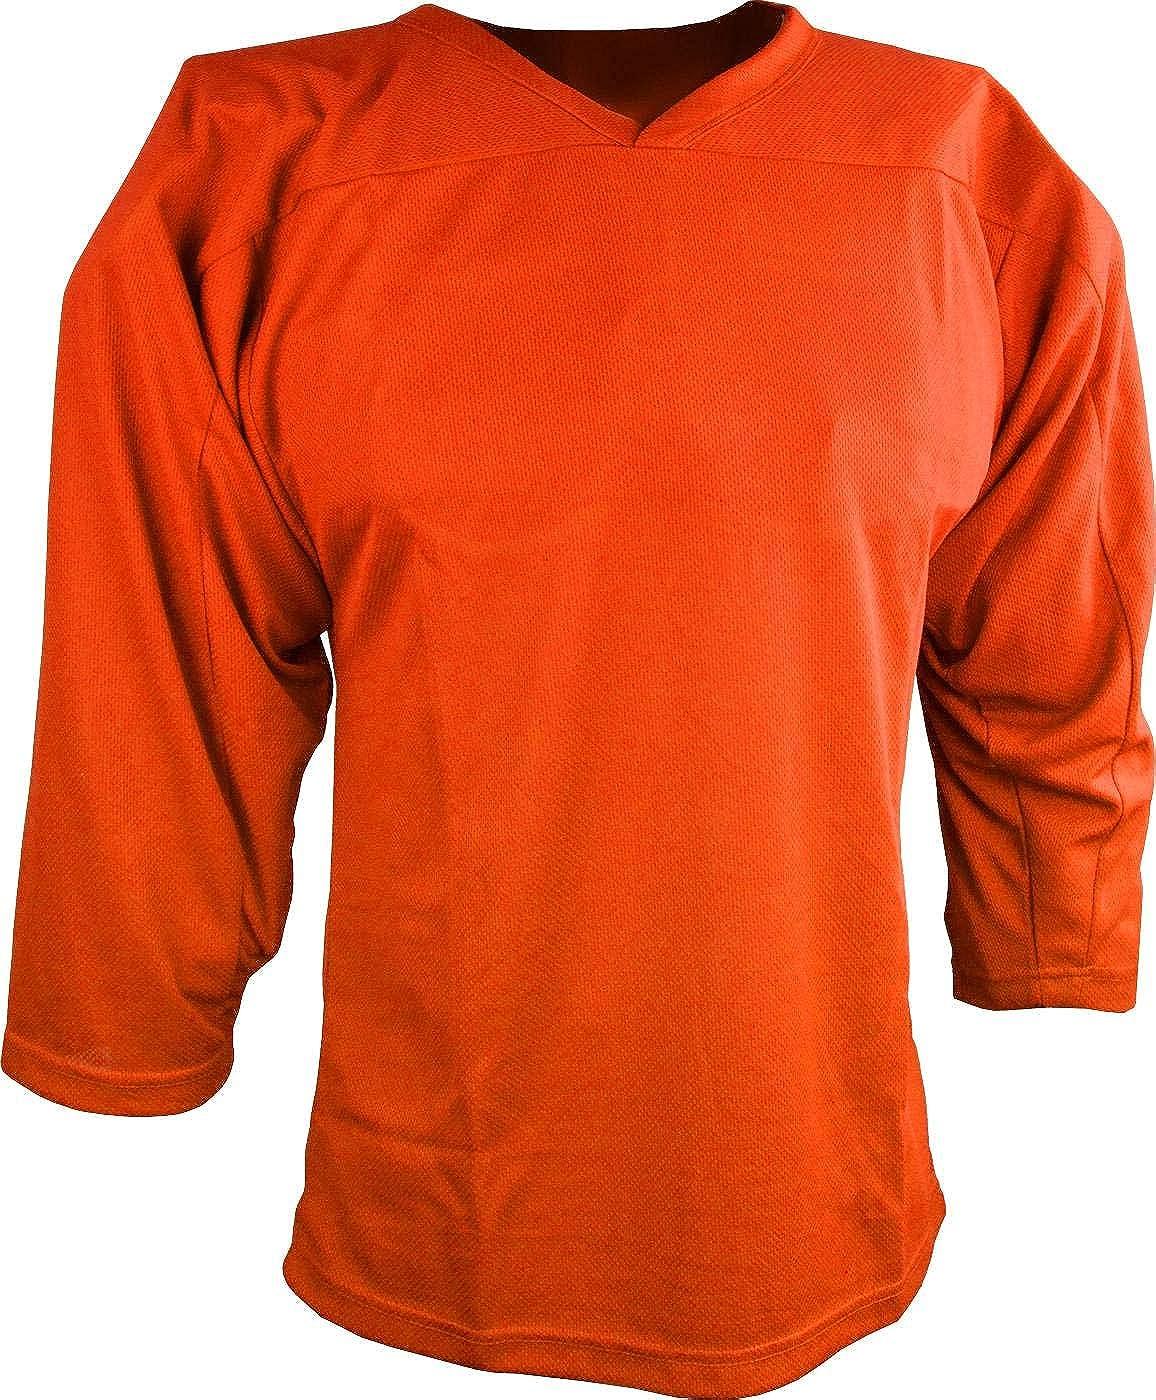 Sports Unlimited Youth Hockey Practice Jersey Orange: Clothing